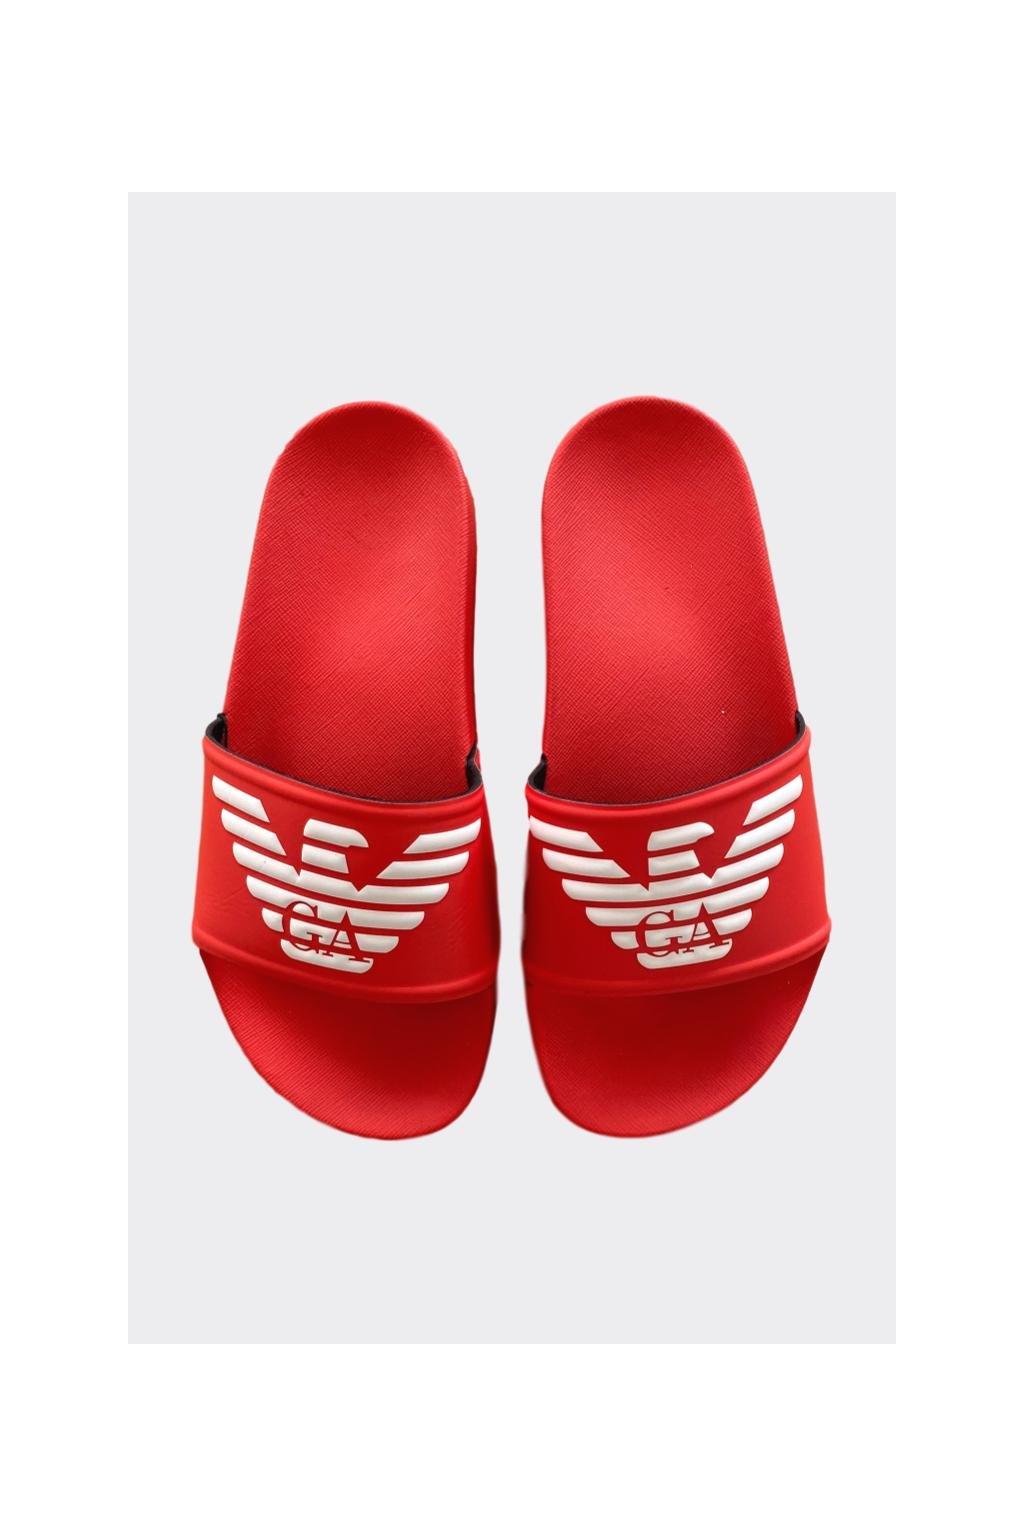 Emporio Armani logo pantofle dámské - korálová